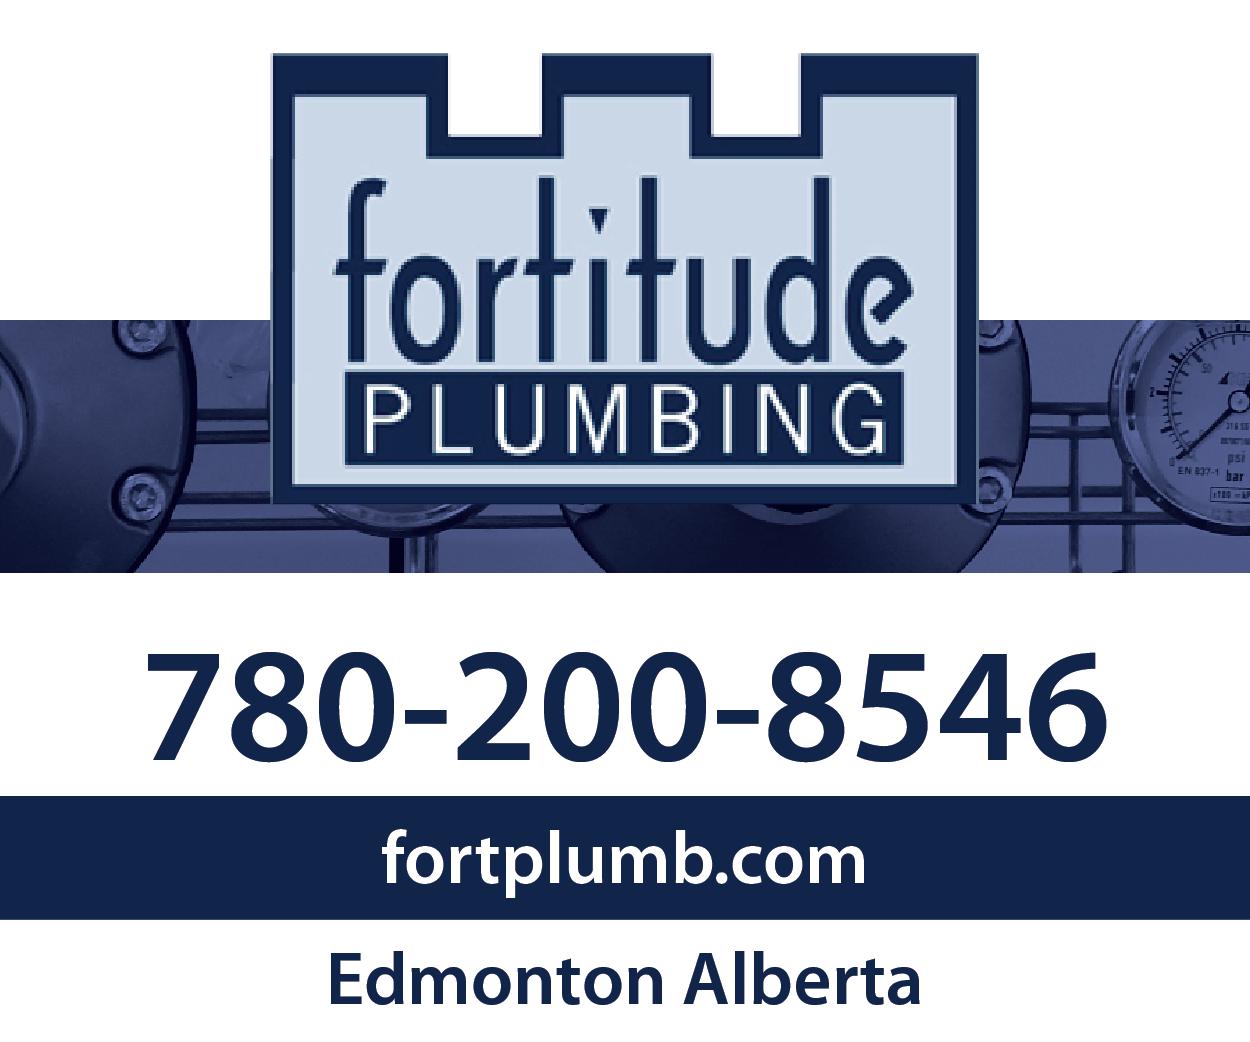 Fortitude Plumbing